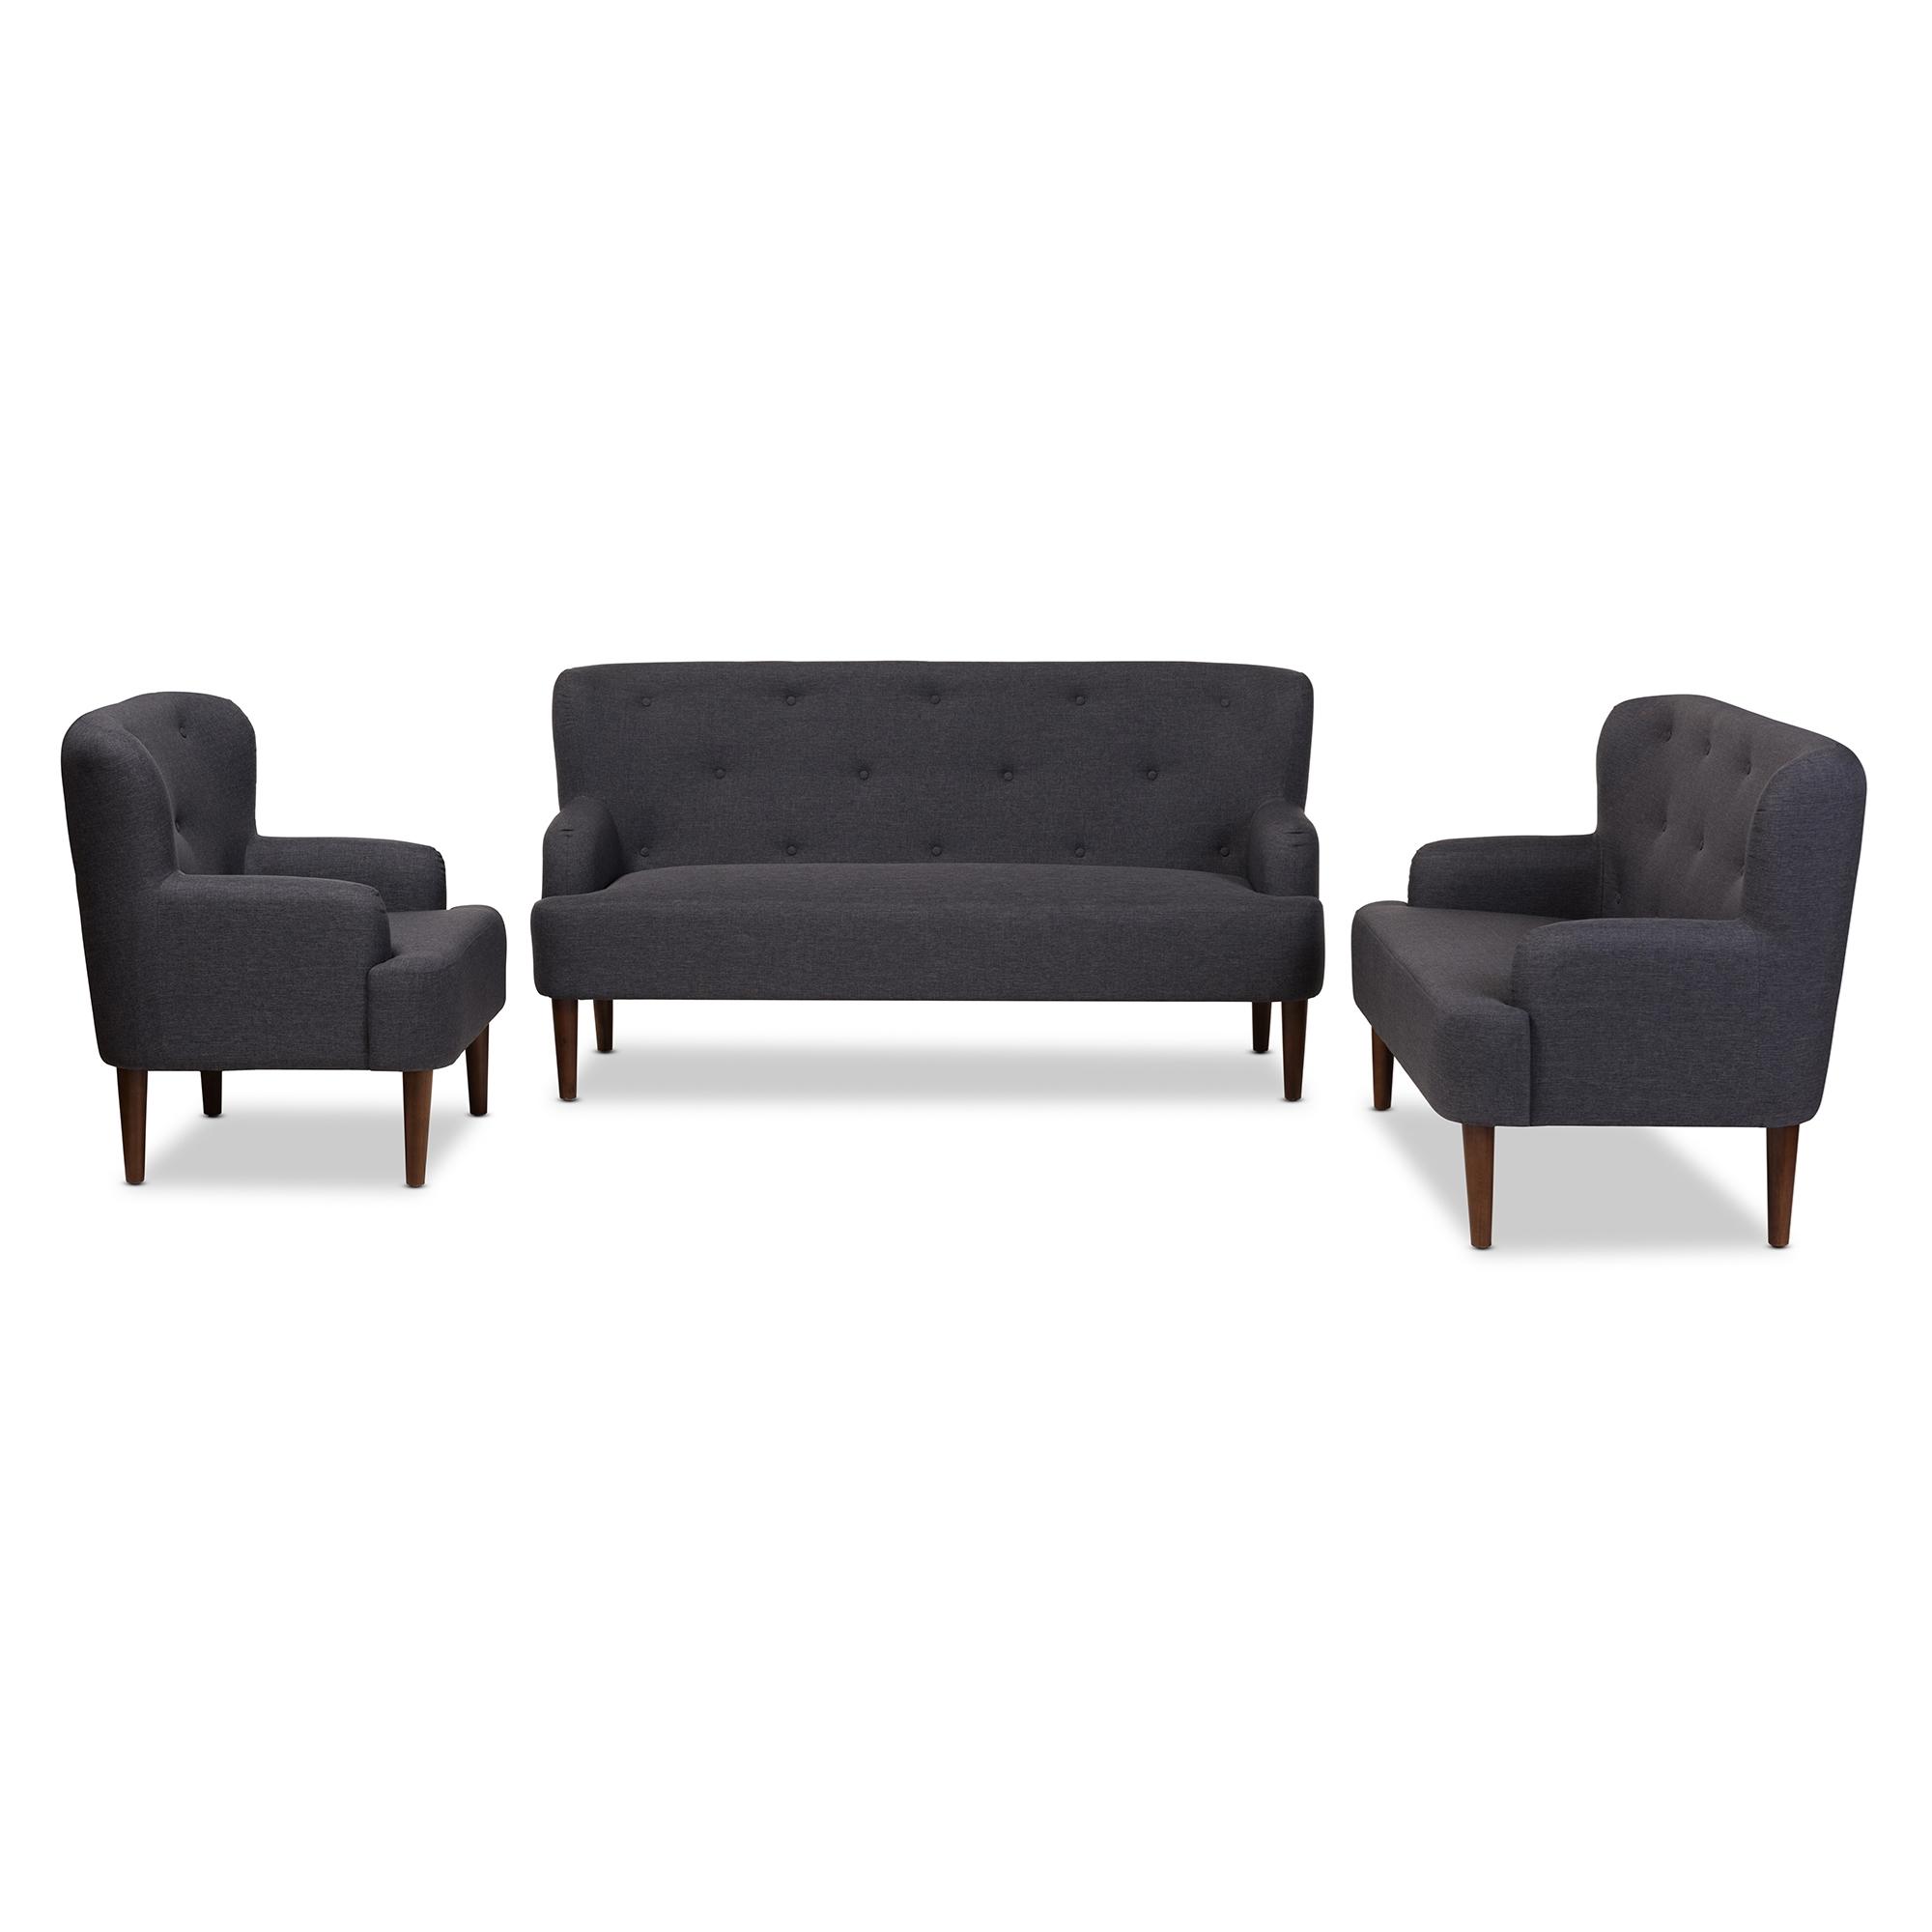 Perfect Baxton Studio Toni Mid Century Modern Dark Grey Fabric Upholstered Walnut  Wood Button Tufted 3 Piece Sofa Set